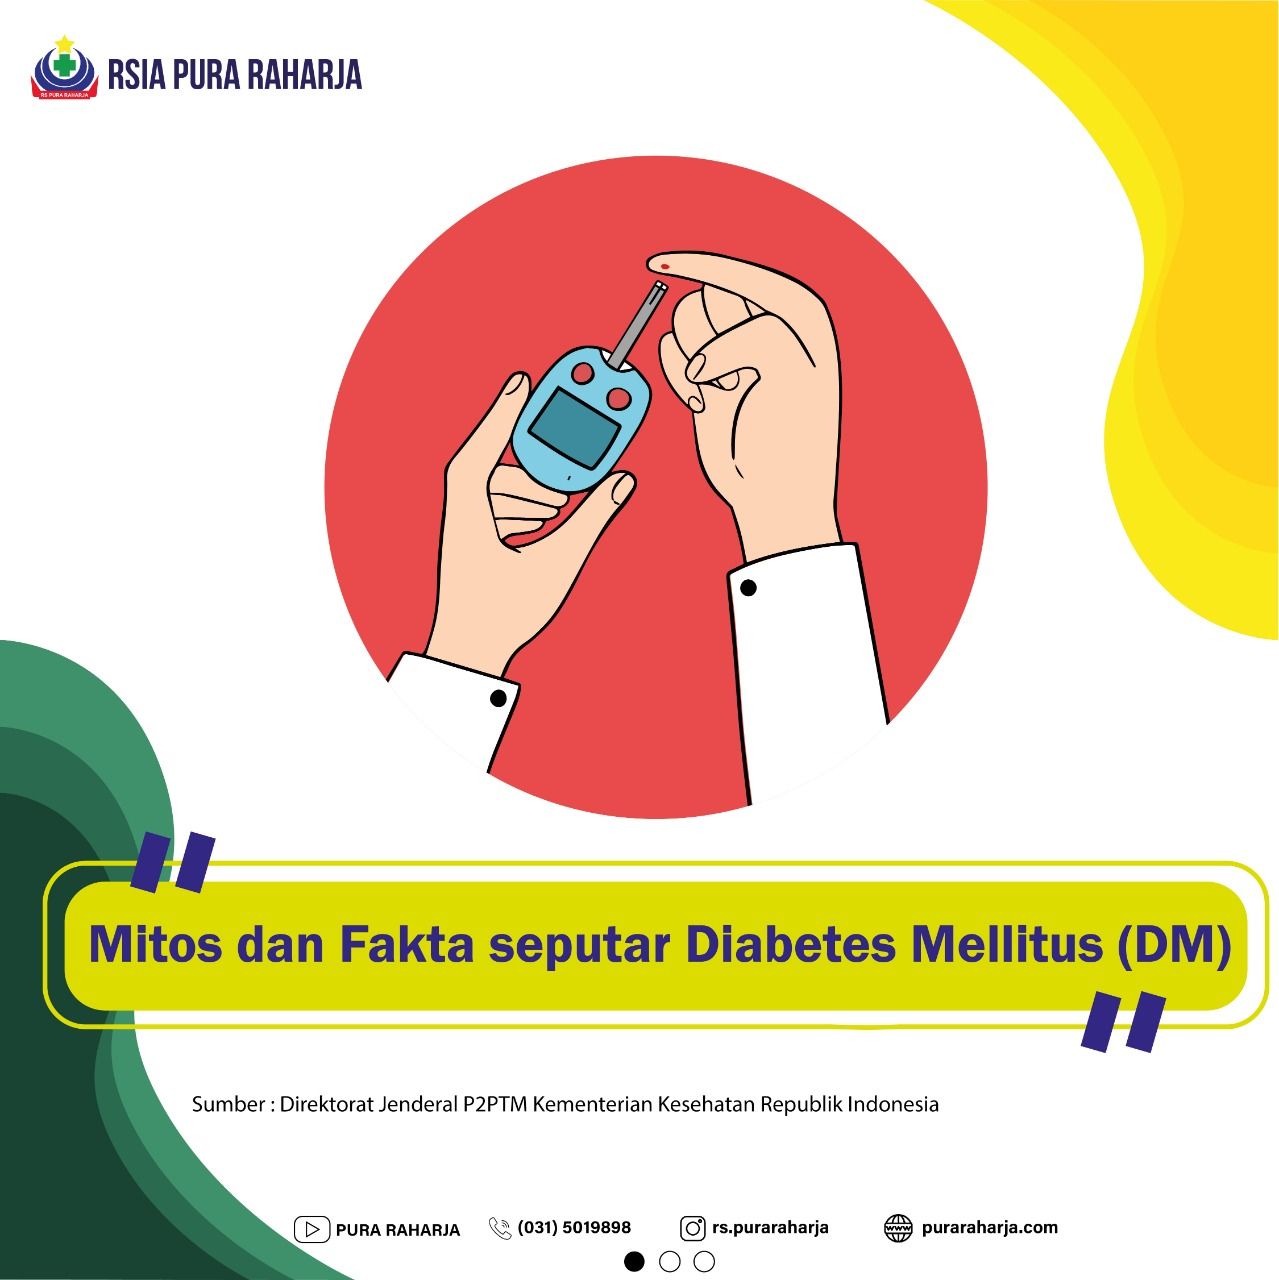 Mitos dan Fakta Diabetes Mellitus